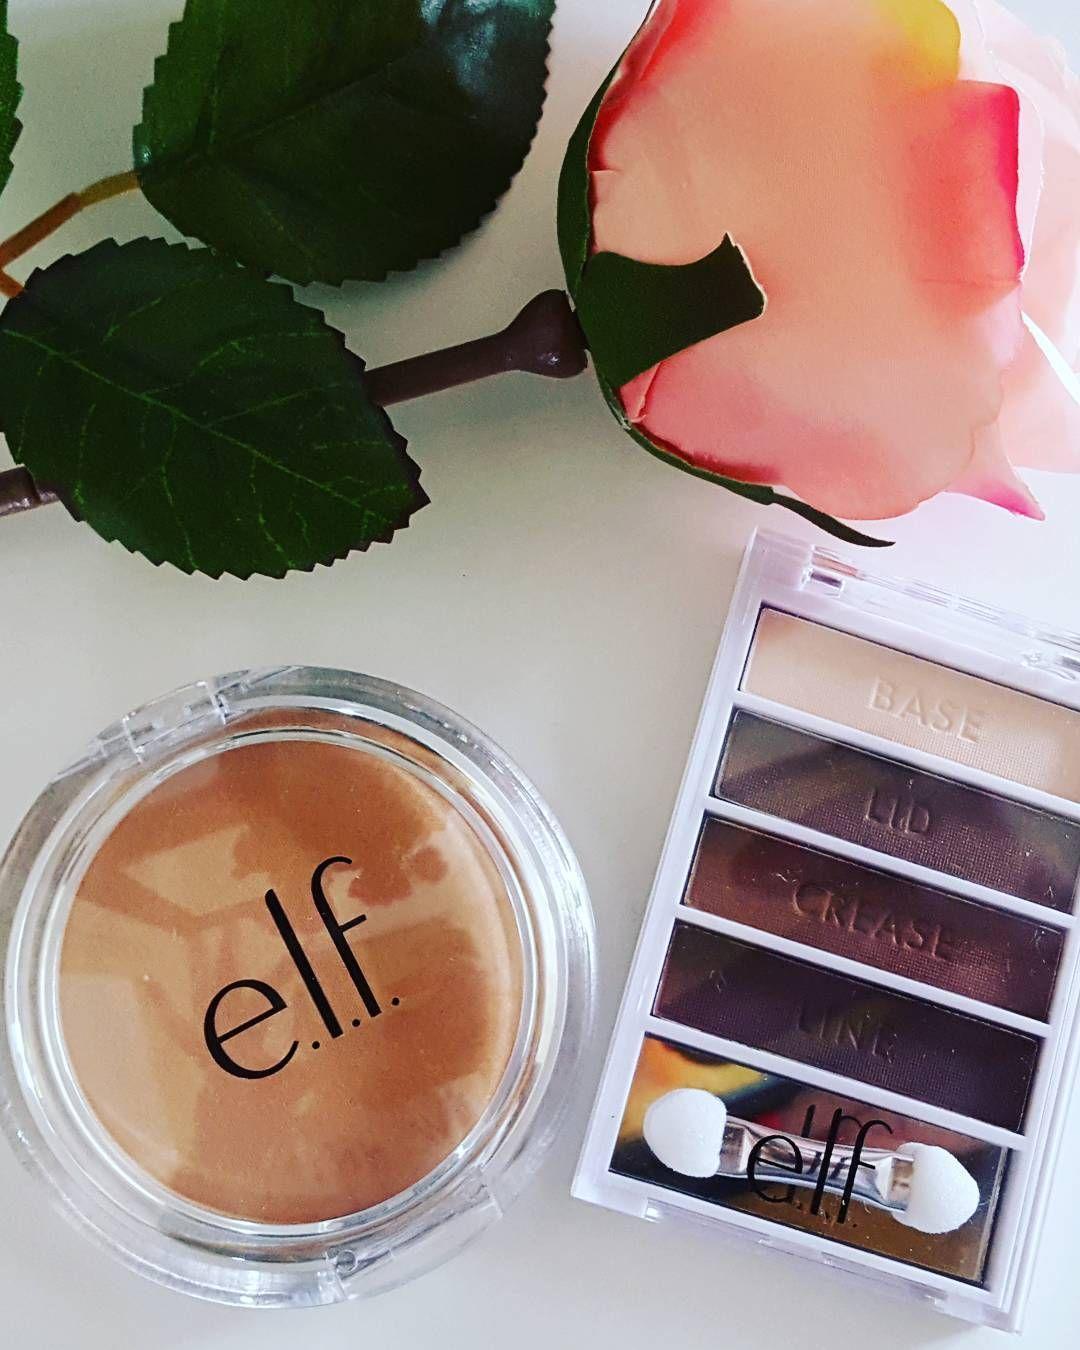 Elf Cosmetics taken from